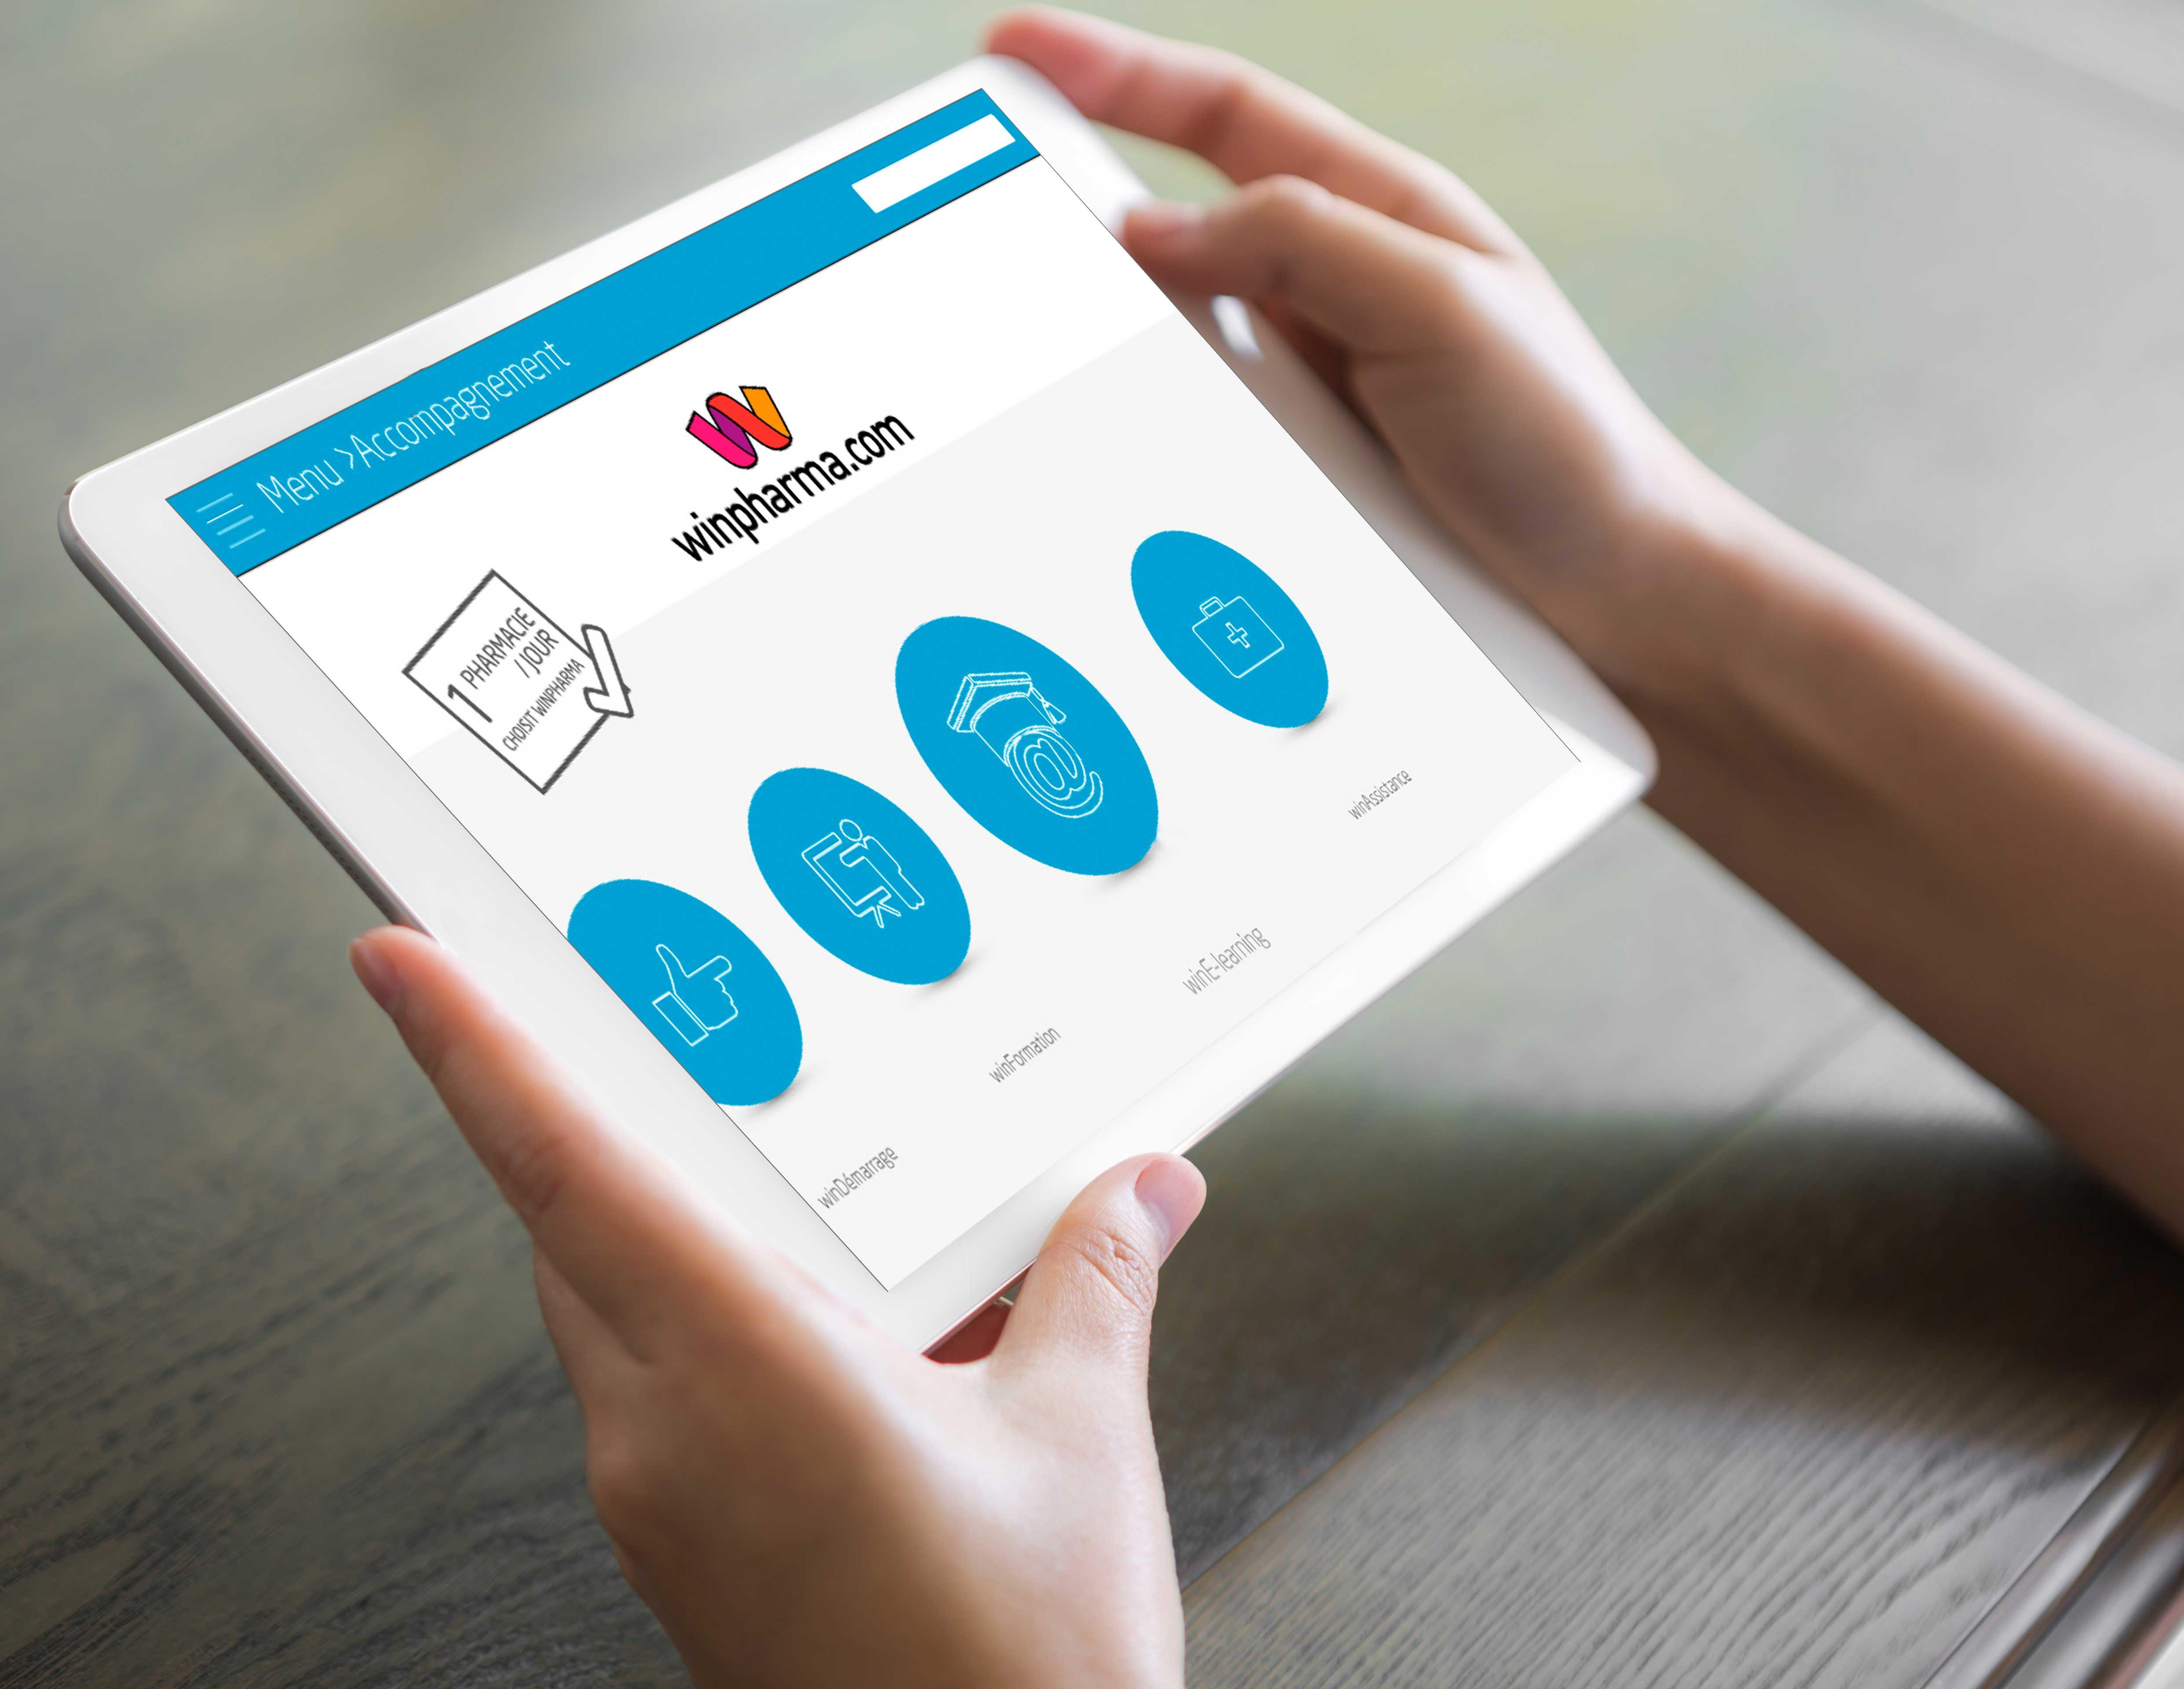 Application tablette Win-Pharma - graphisme et intégration